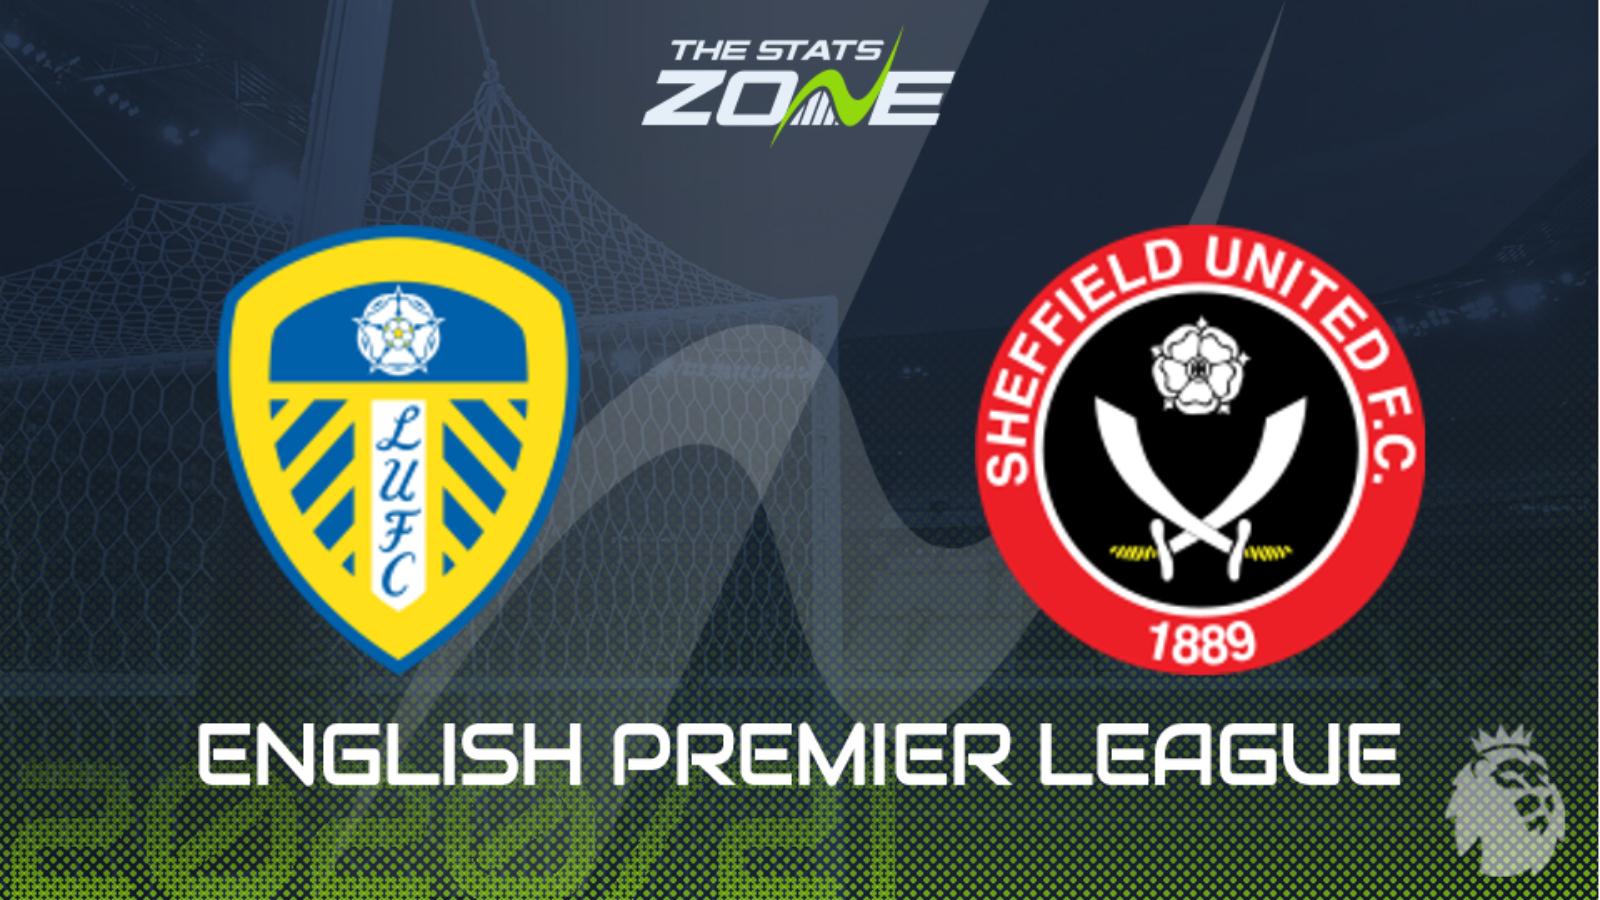 Leeds United vs Sheffield United Full Match – Premier League 2020/21